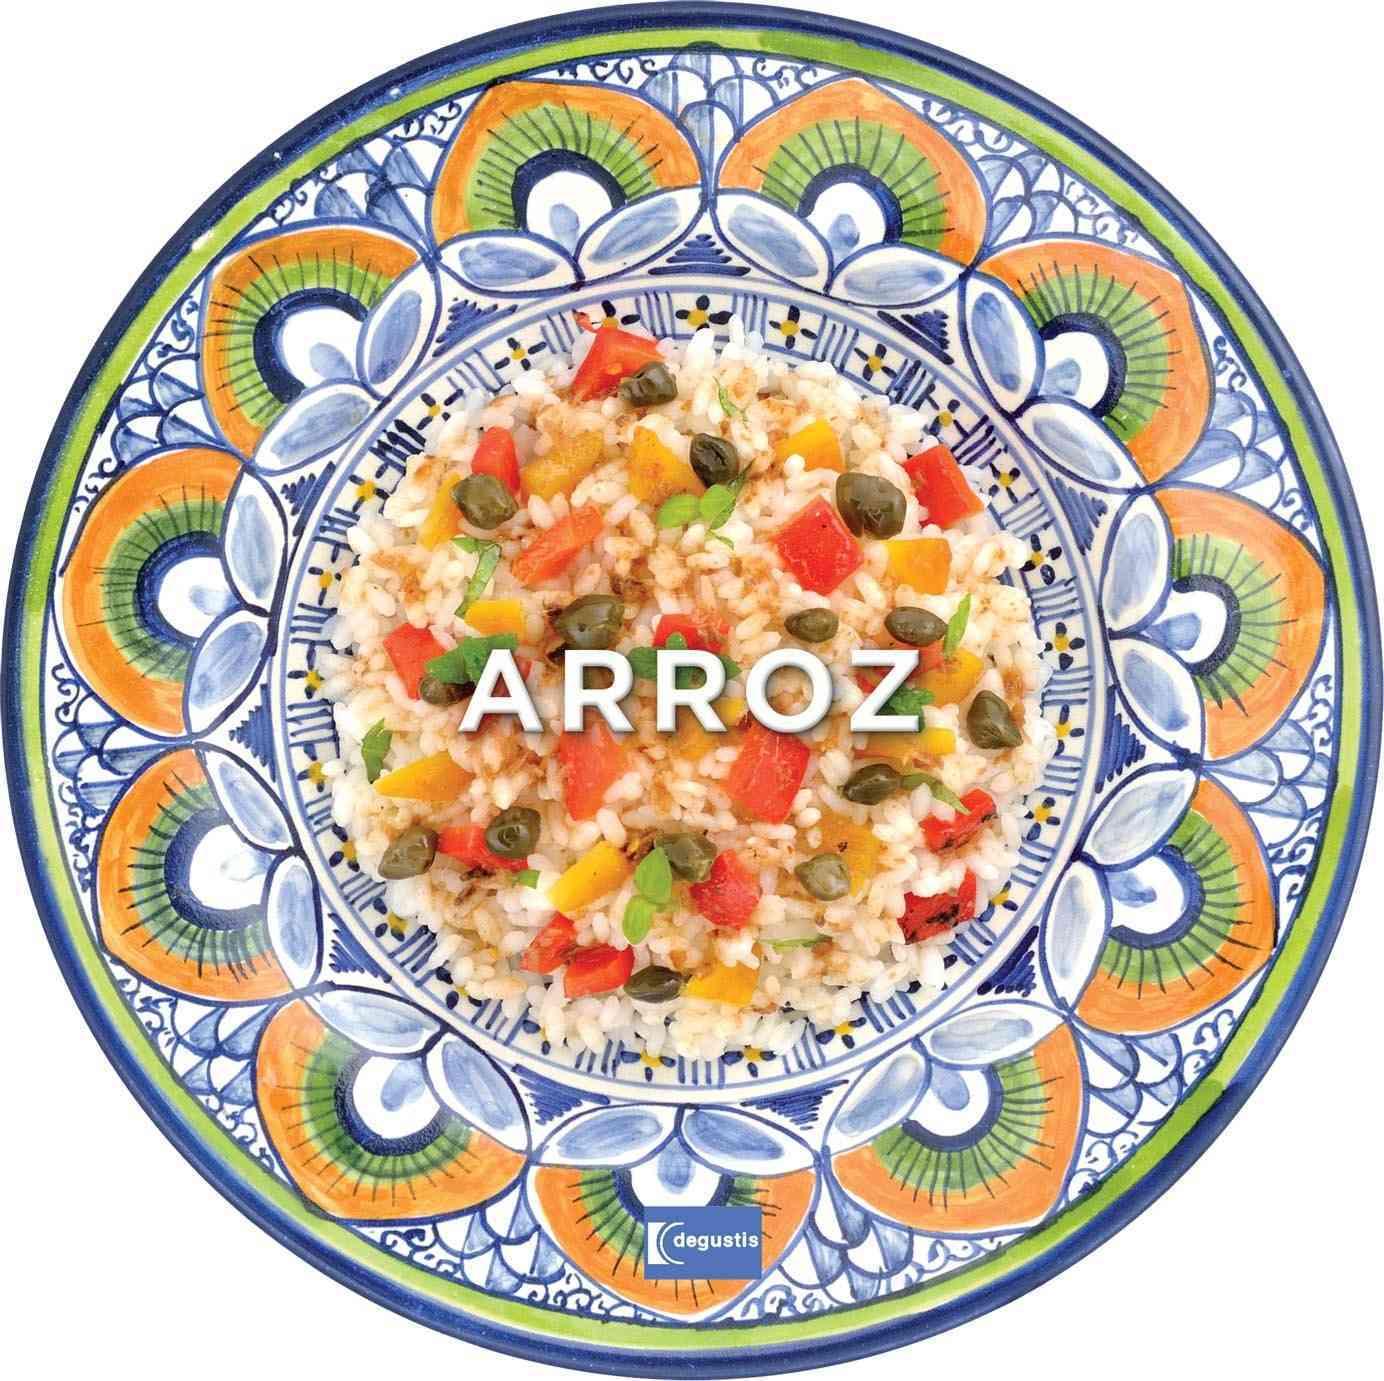 Scodella Arroz / Scodella Rice By Bardi, Carla